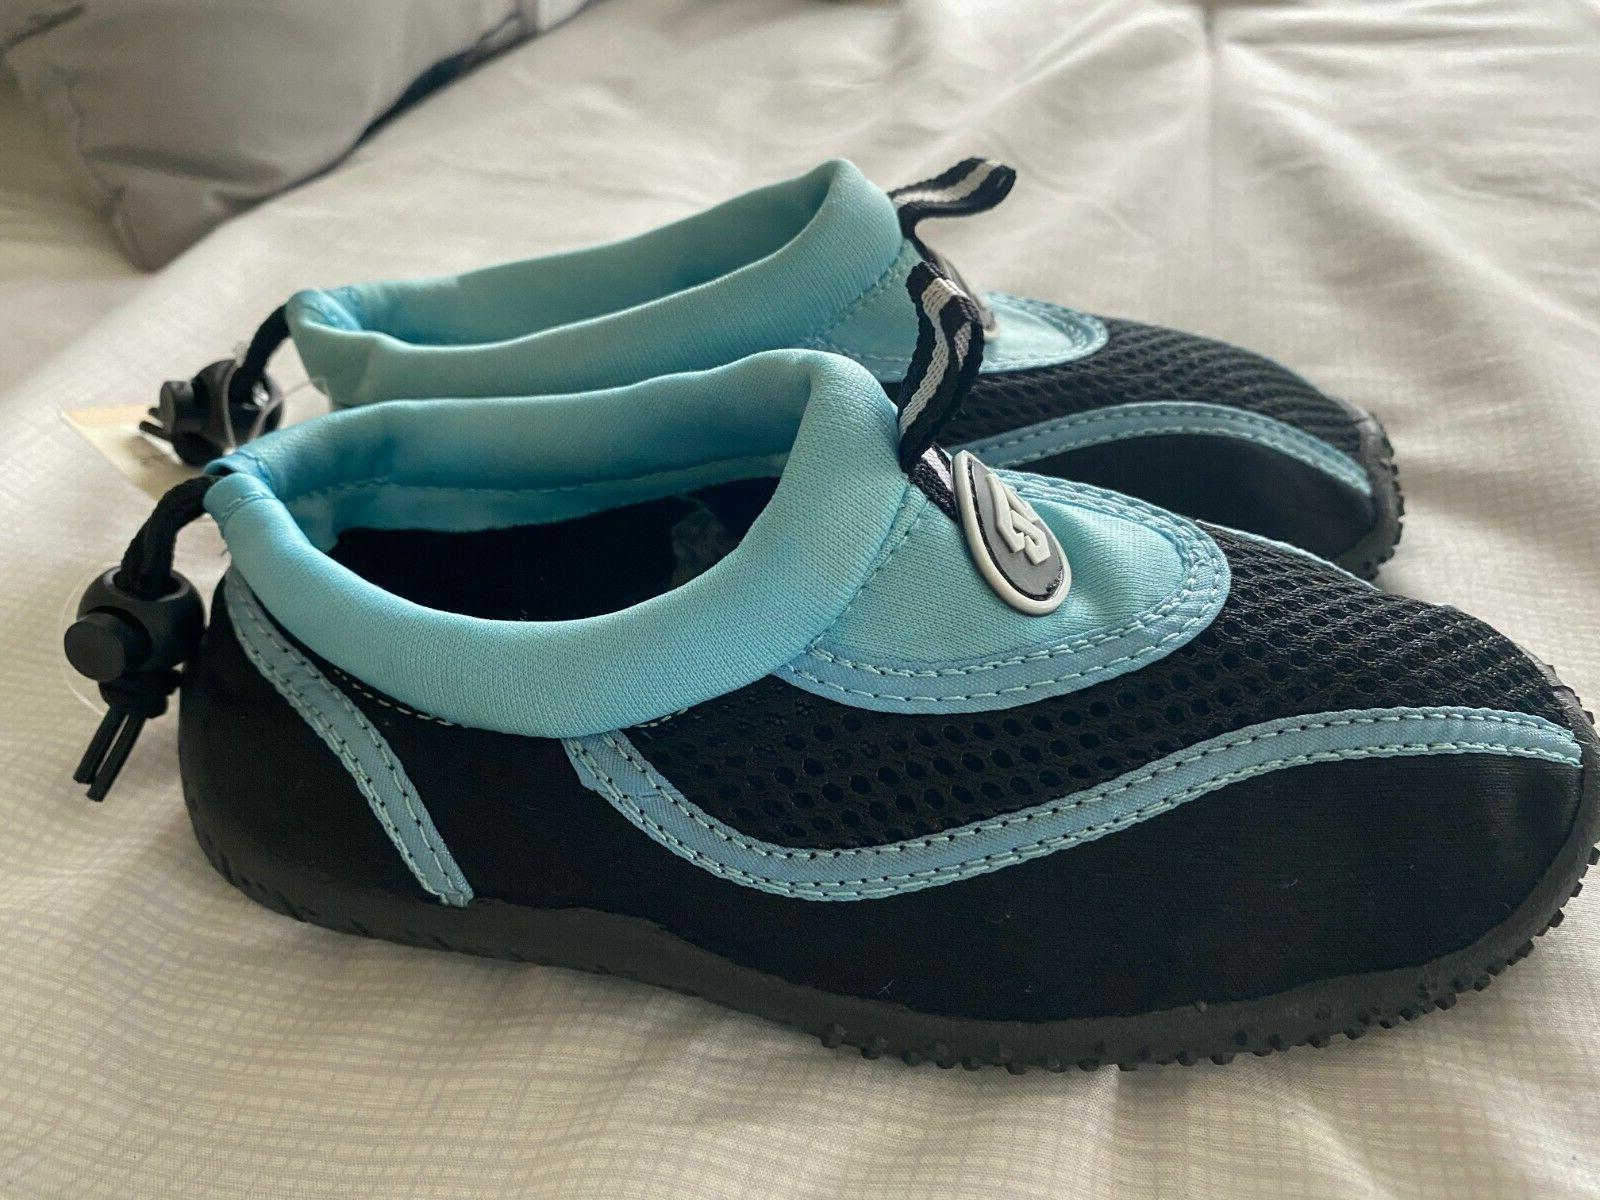 Kids Childrens Shoes Socks Beach